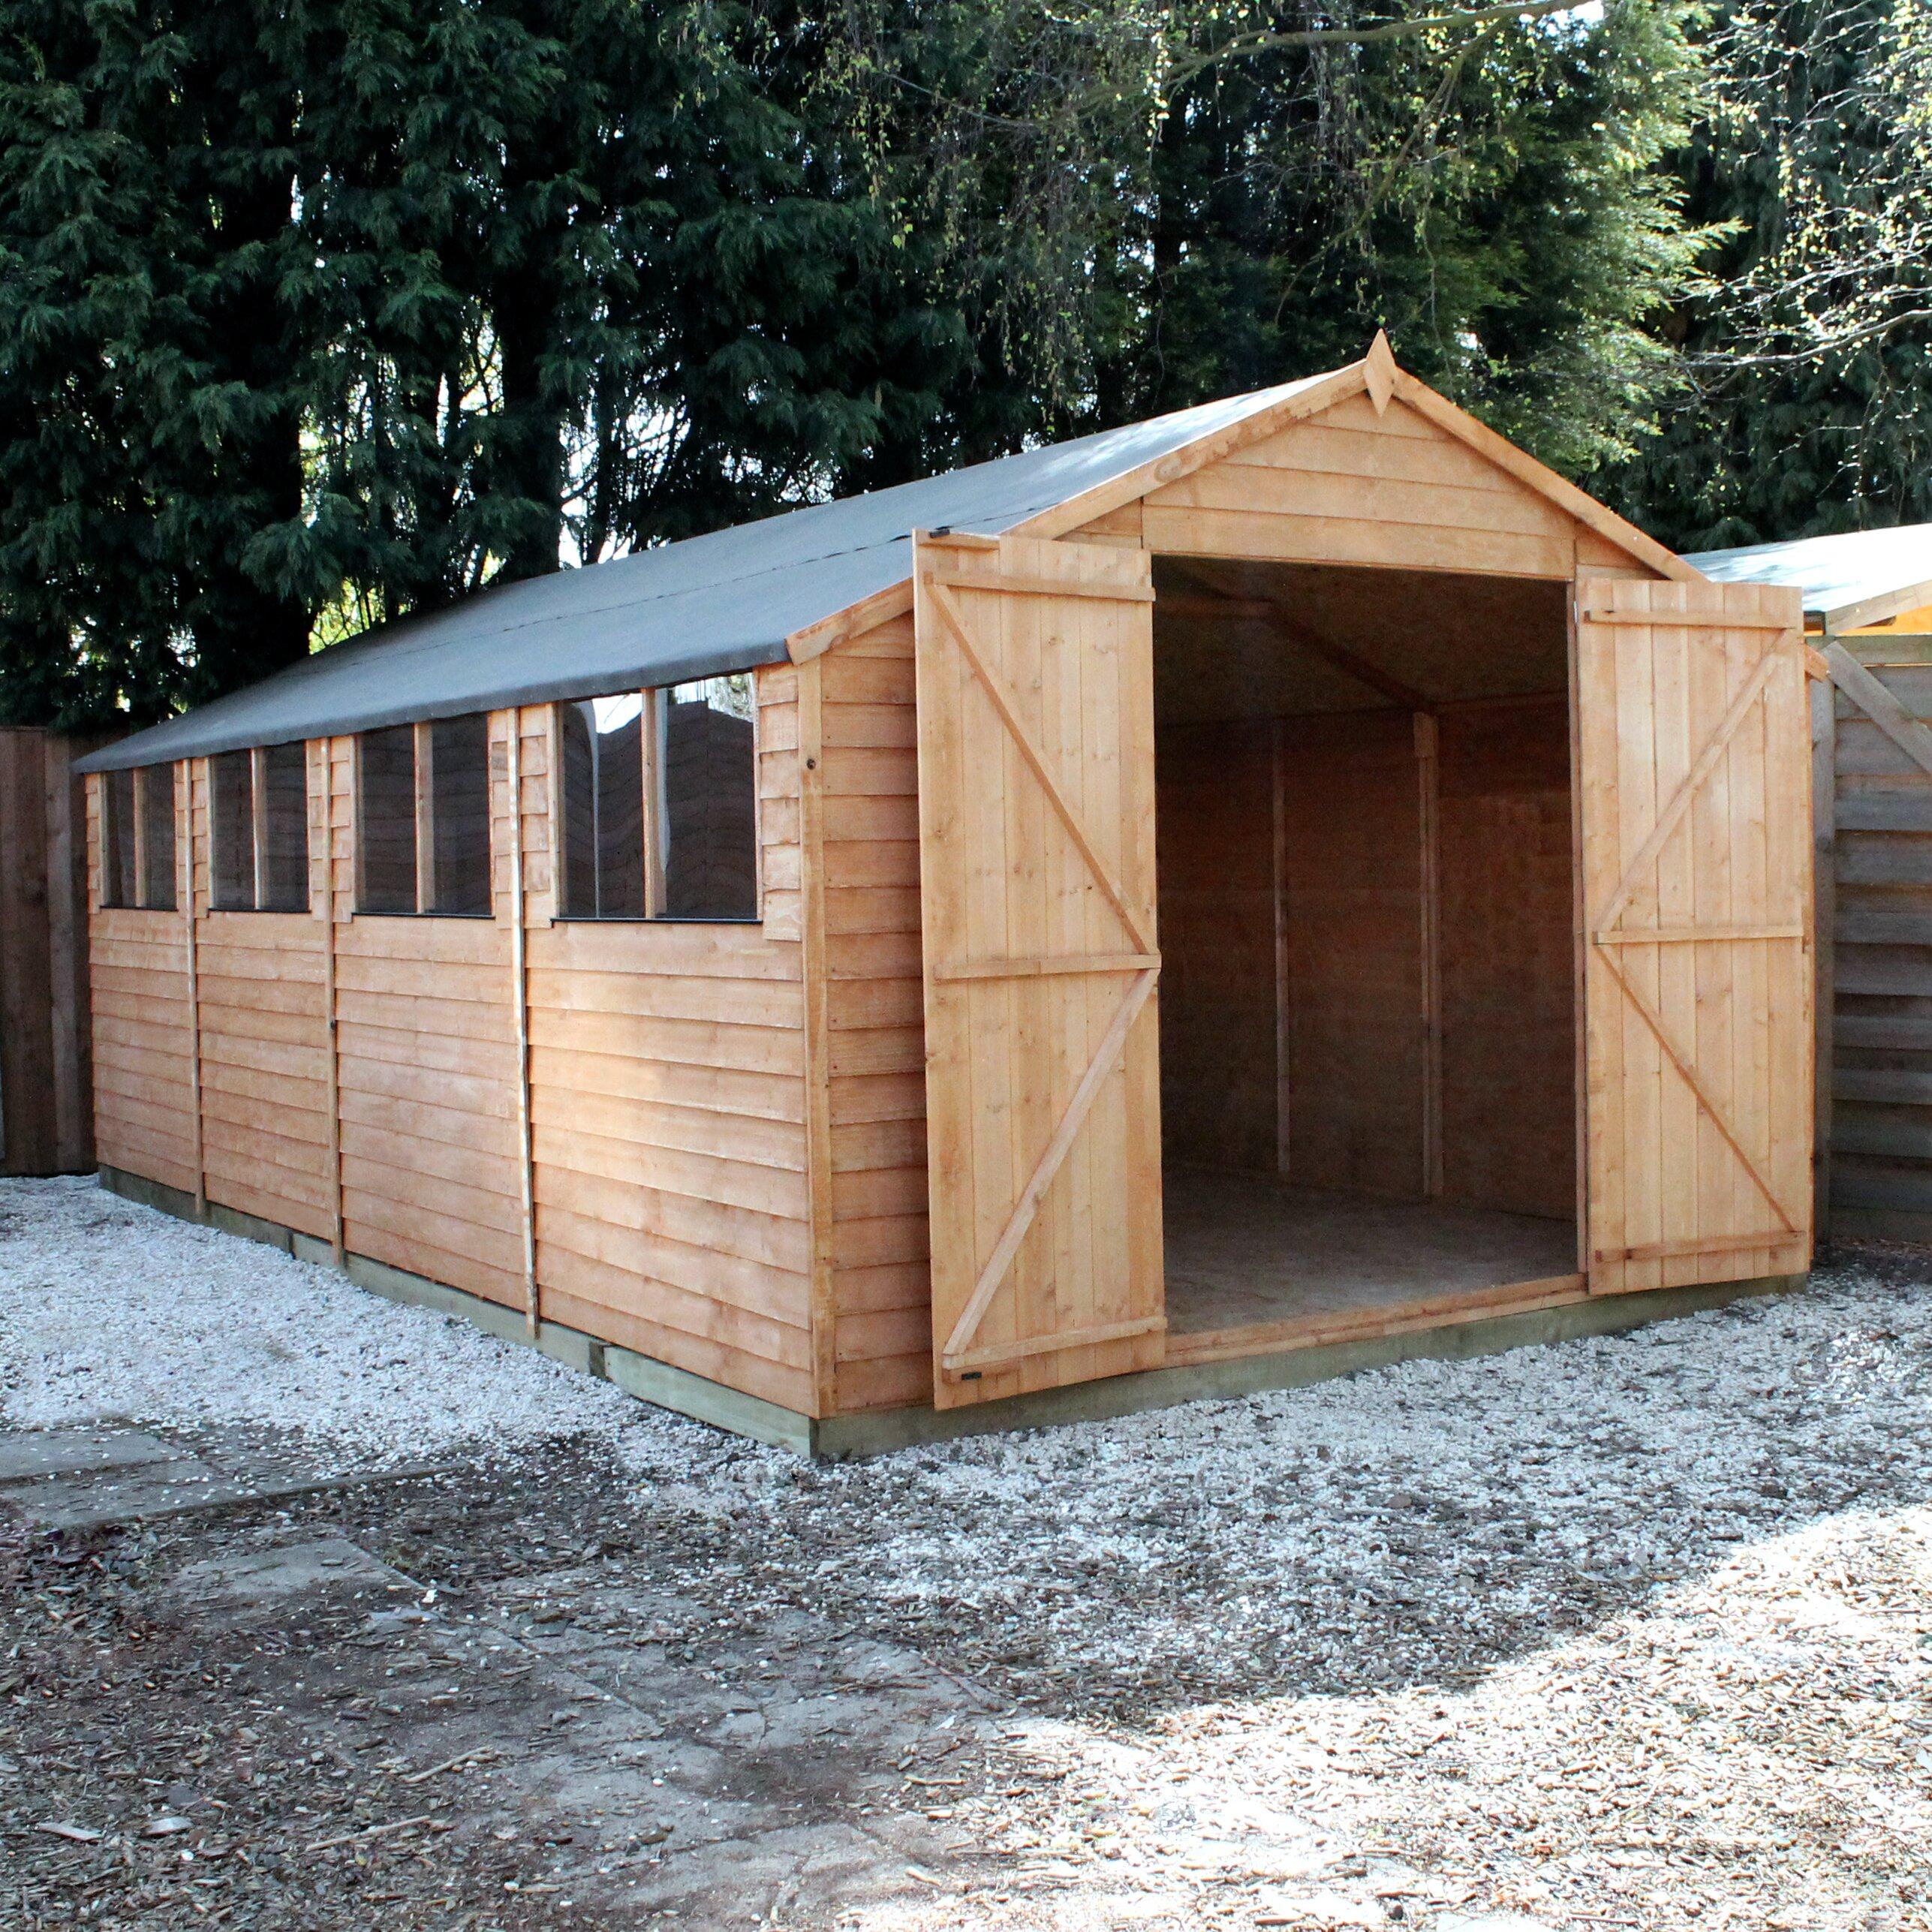 Mercia Garden Products 20 x 10 Overlap Apex Shed | Wayfair UK